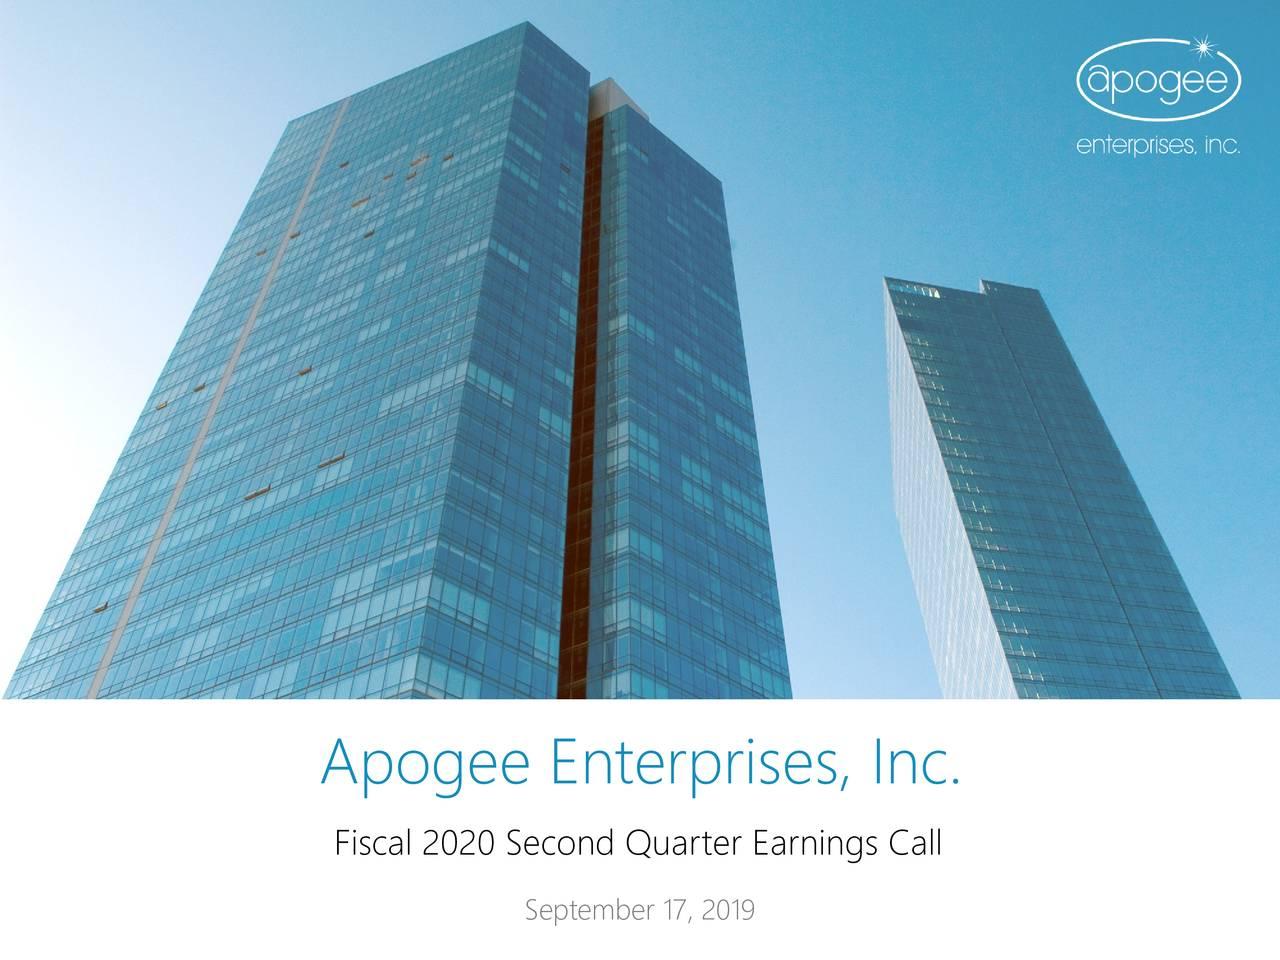 Apogee Enterprises, Inc. 2020 Q2 - Results - Earnings Call Slides